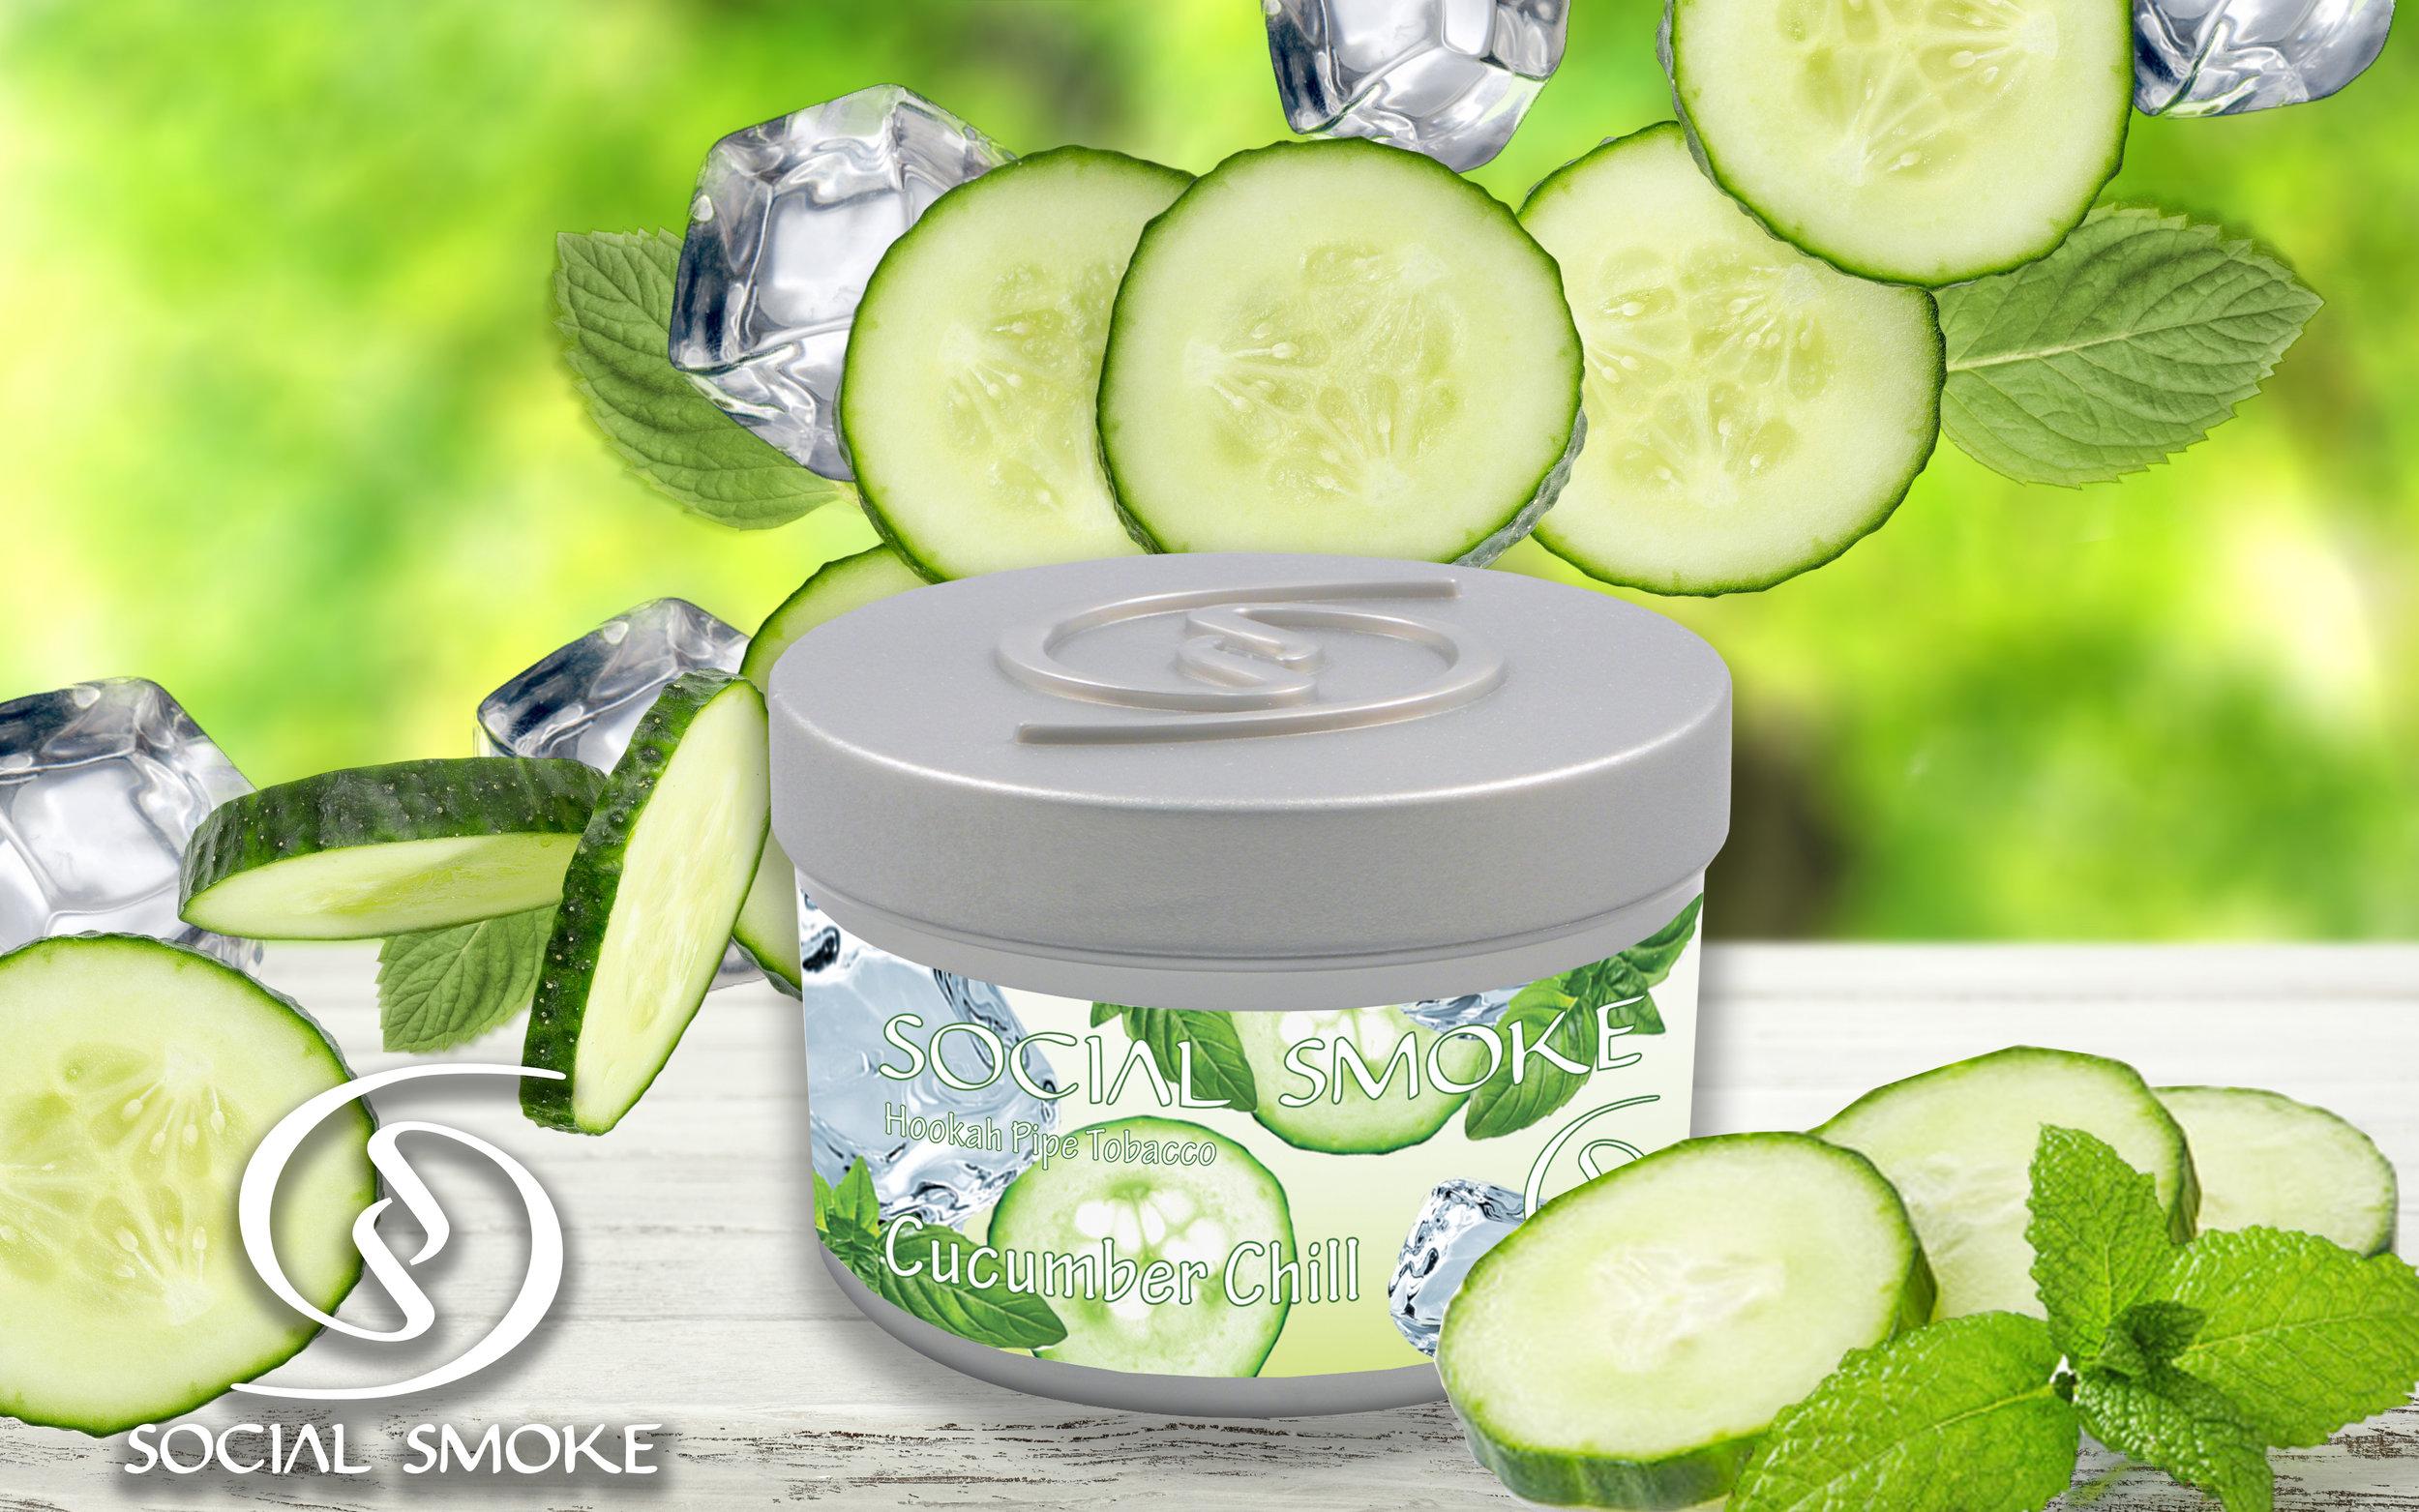 Cucumber Chill Ad.jpg